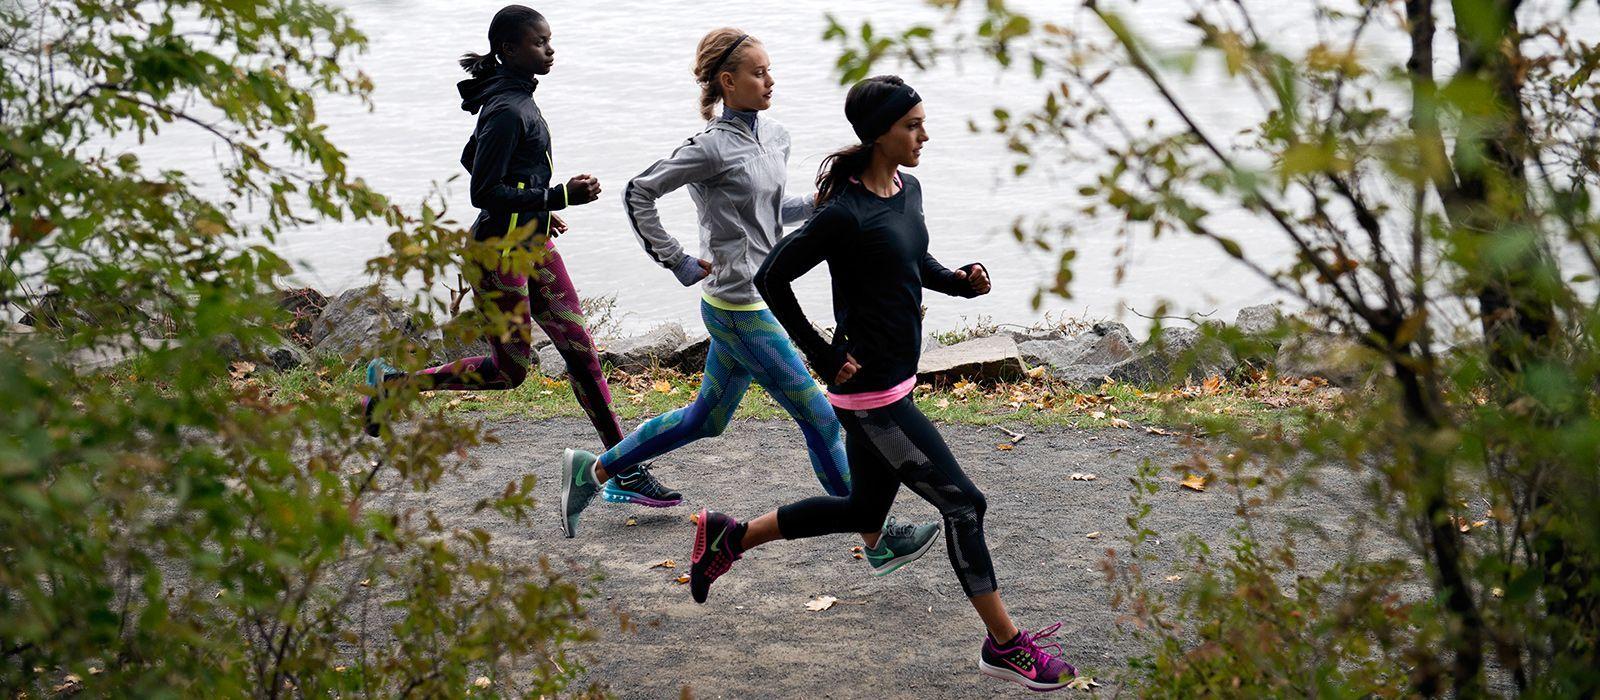 correr-en-grupo-deporte-siemprehayalgoqueponerse